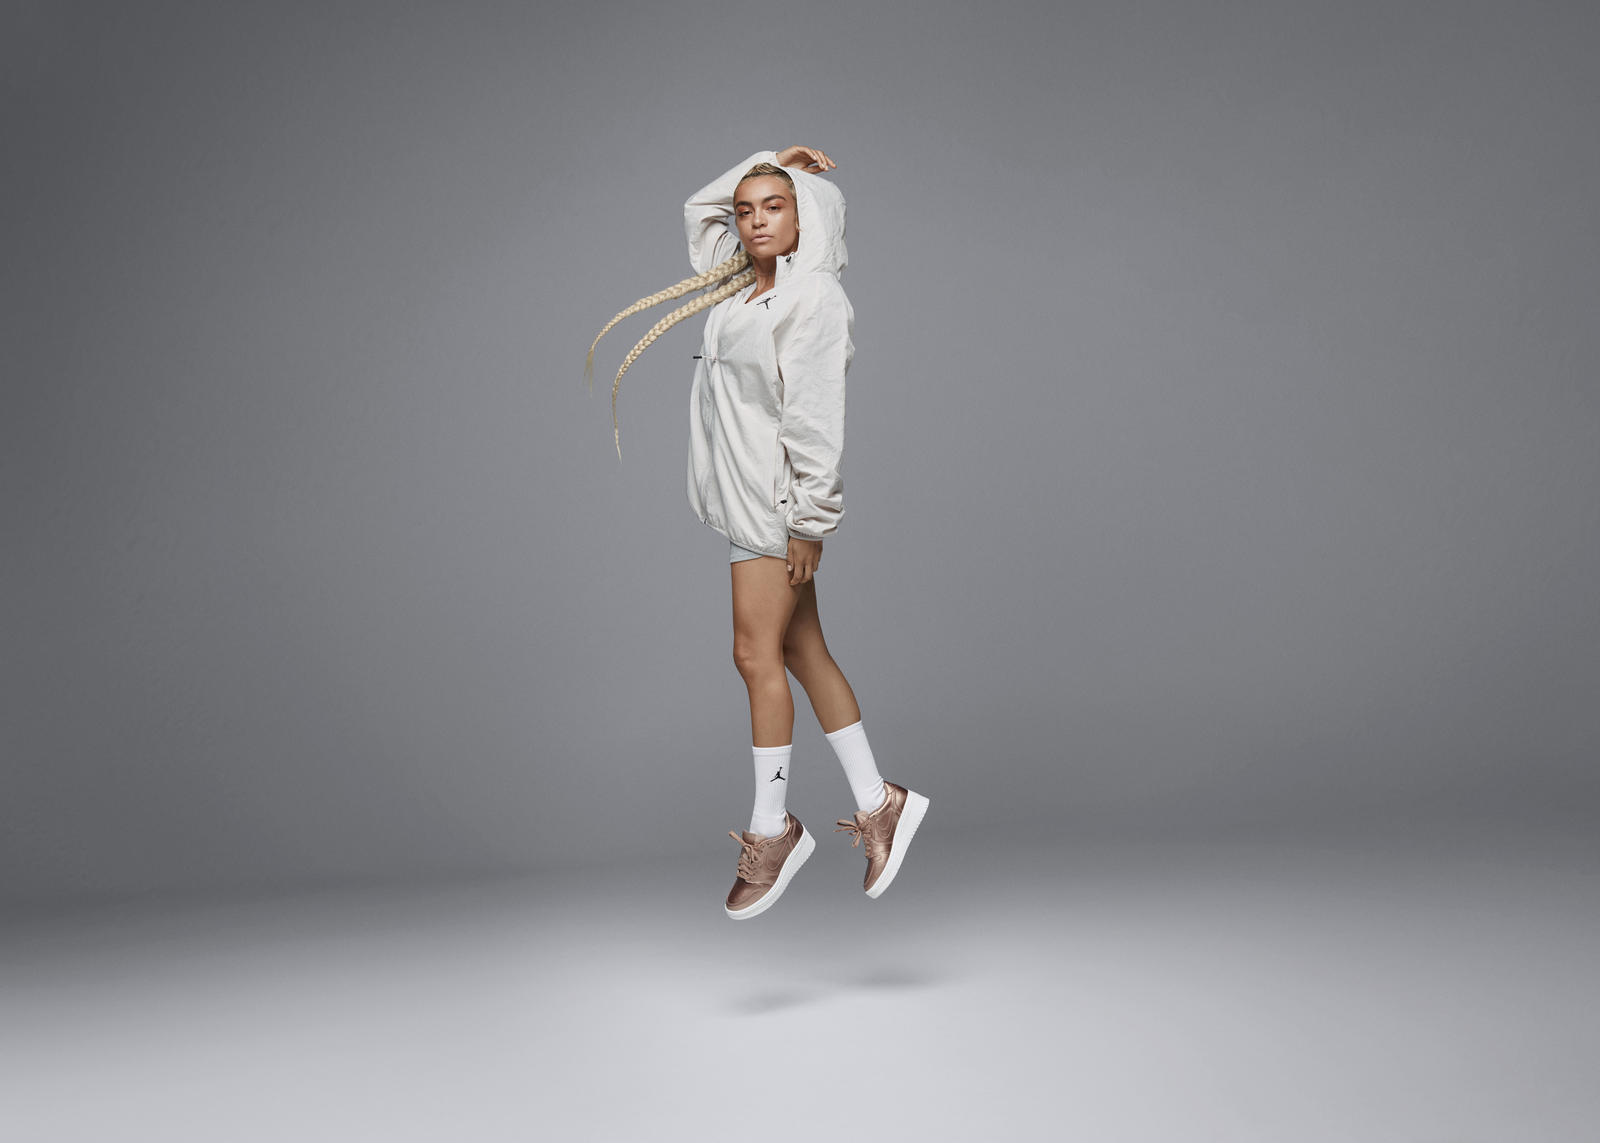 san francisco 991c7 41adb Jordan Brand Unveils Women's 2018 Summer Styles - Nike News